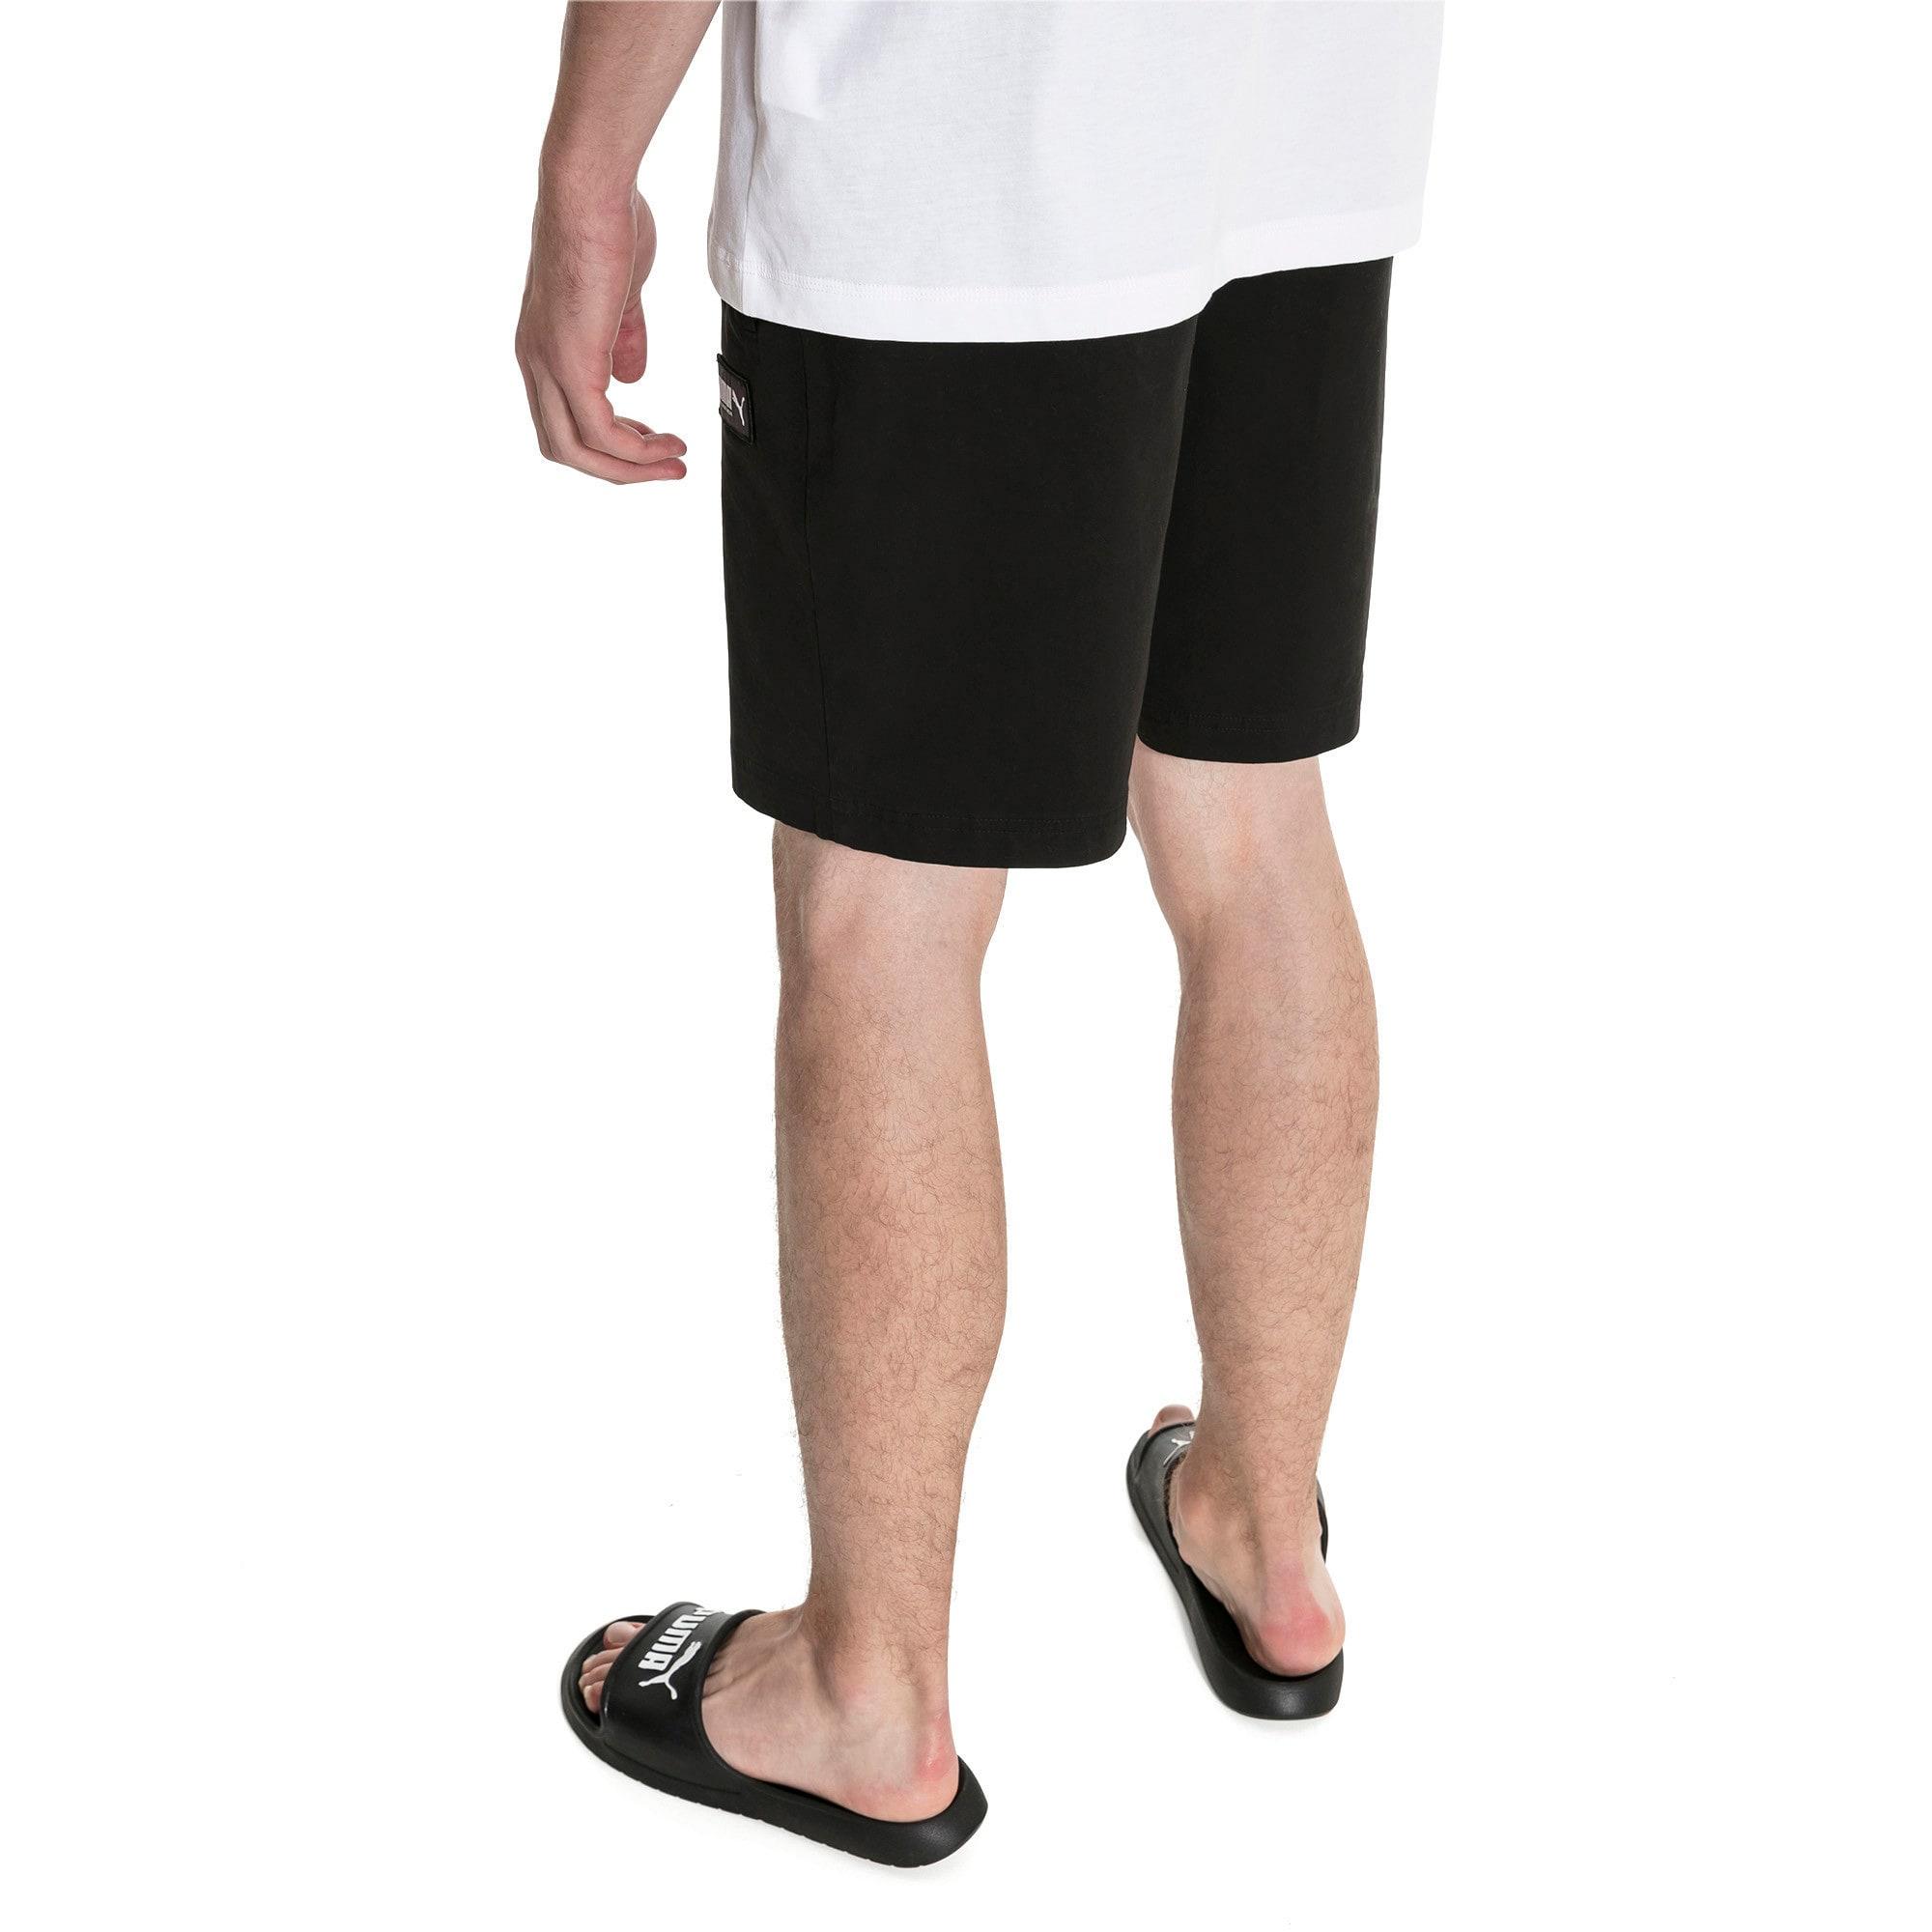 Thumbnail 2 of Fusion Men's Shorts, Puma Black, medium